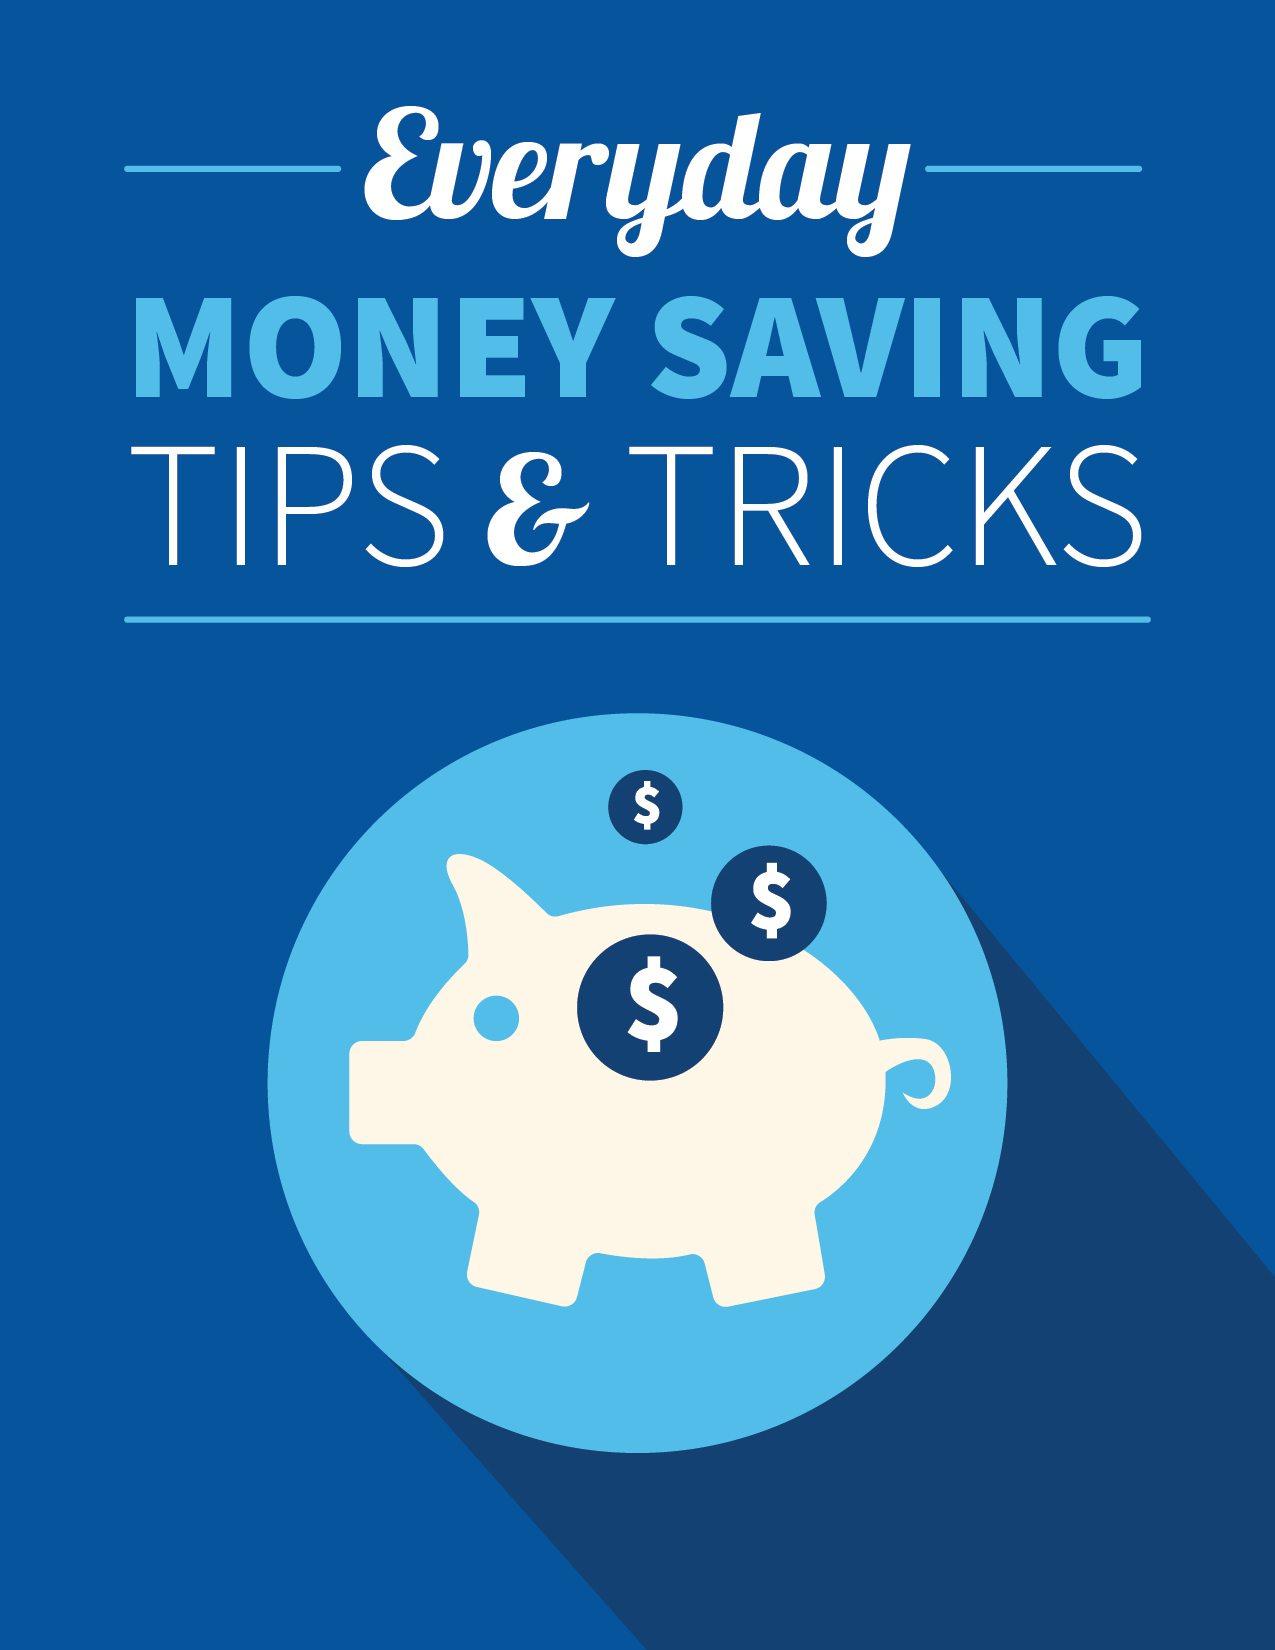 Everyday Money Saving Tips & Tricks